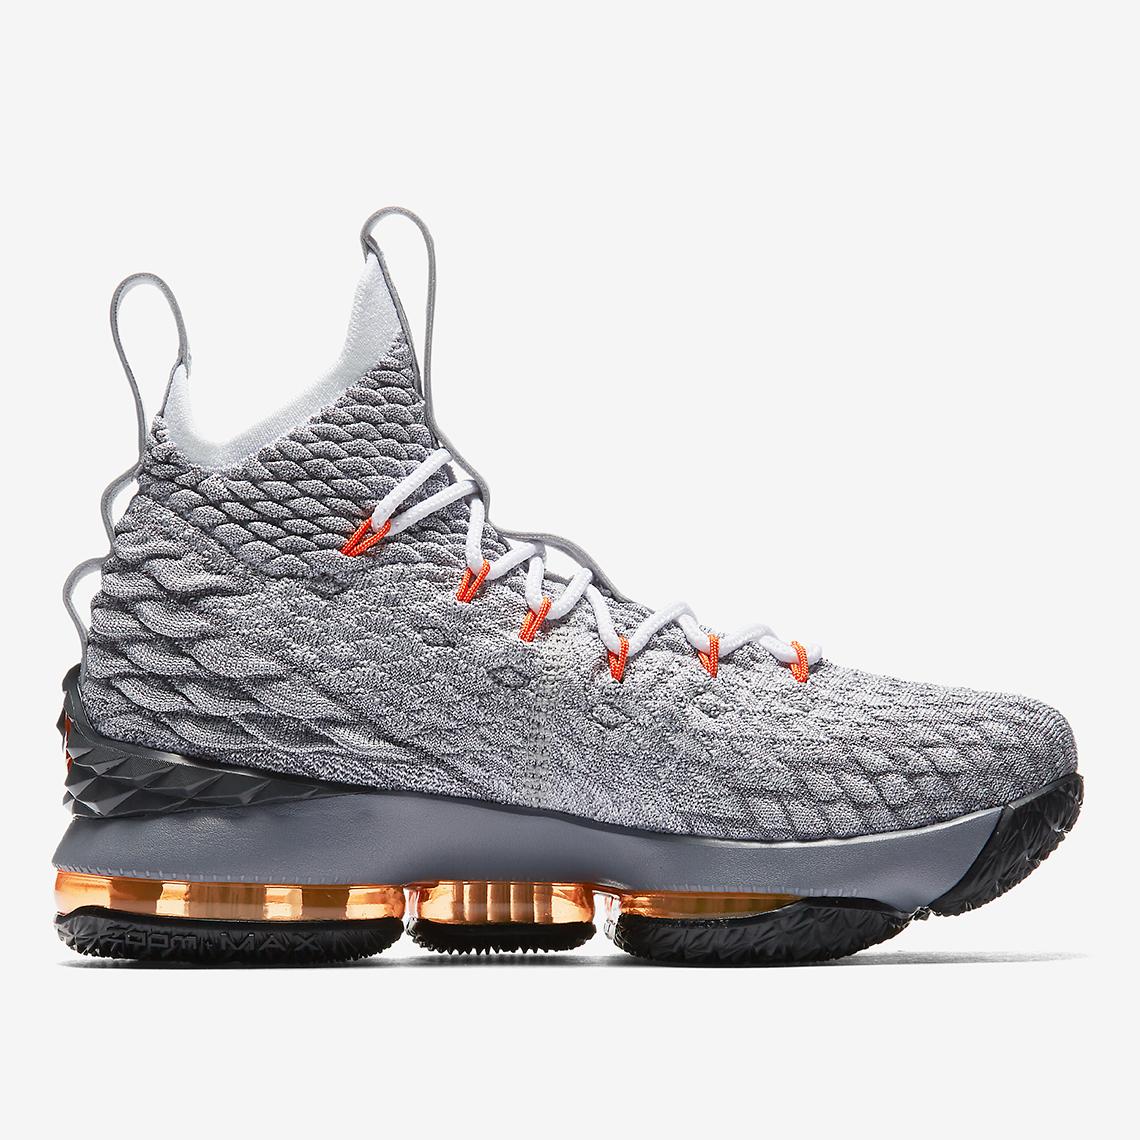 new product 2d3ba c39a4 Nike LeBron 15